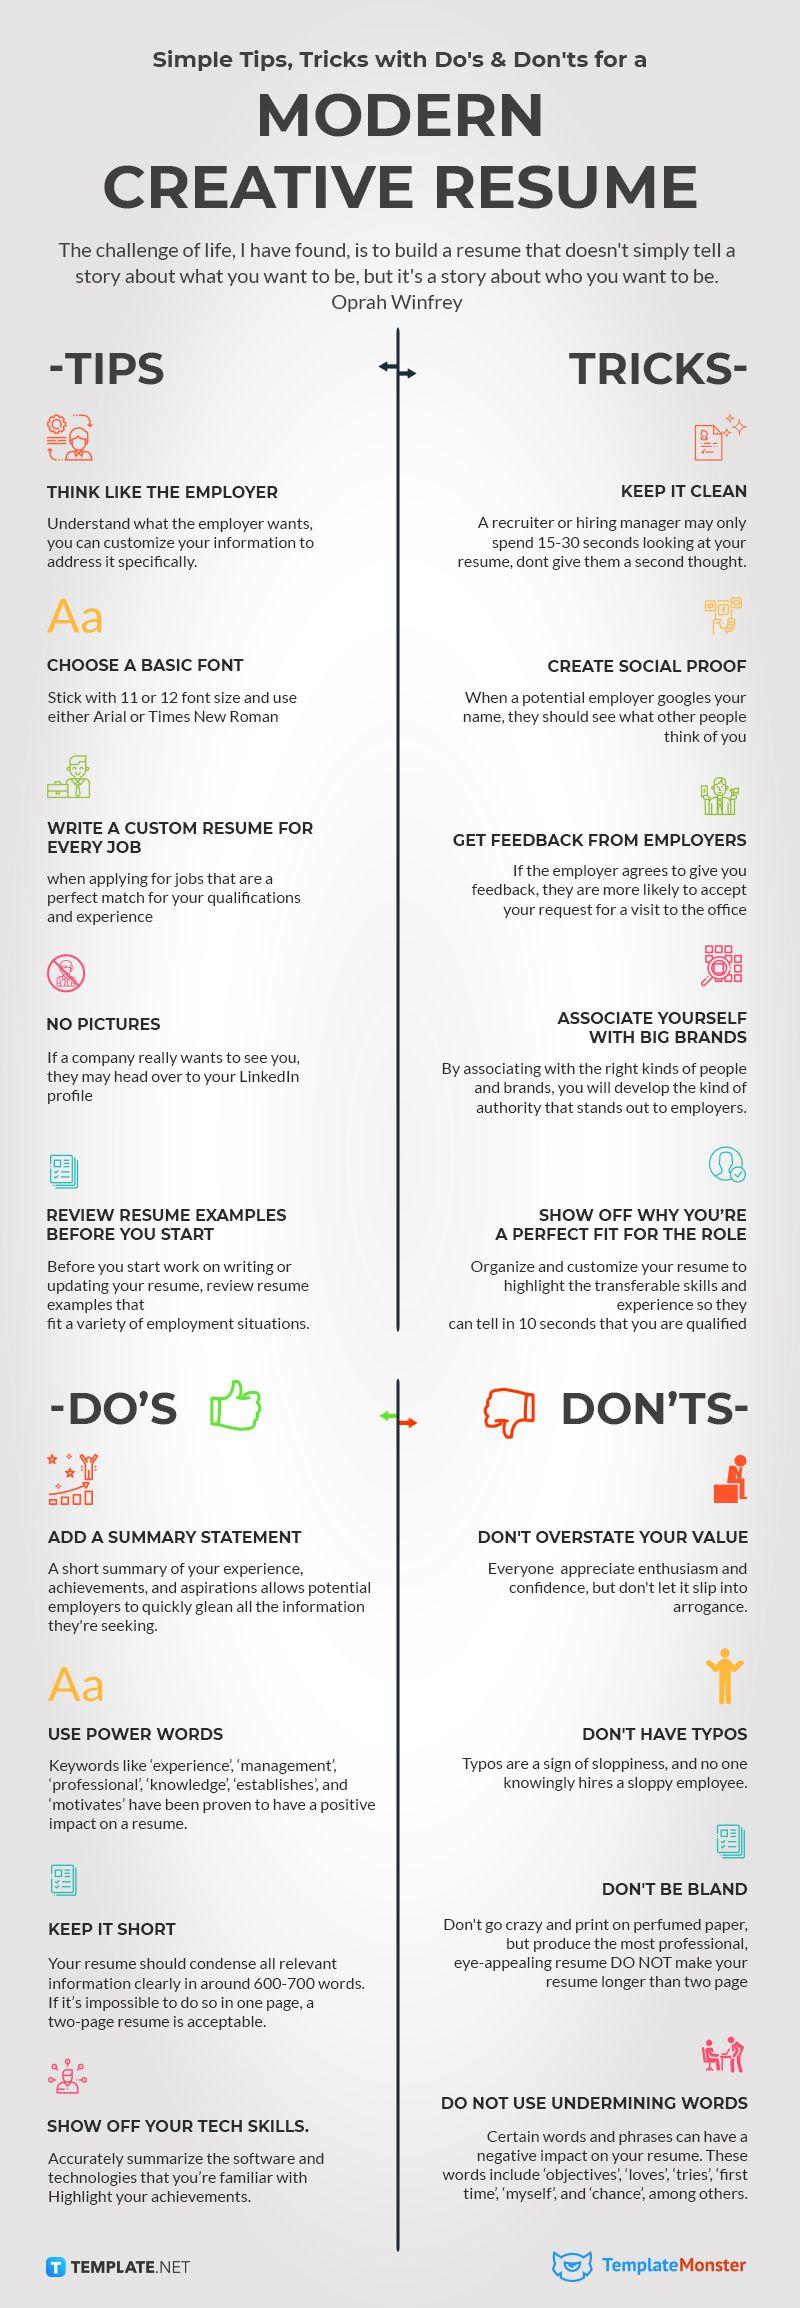 Best Cvs Using Microsoft Word Templates Google Doc Resume Template Resume Writing Services Resume Tips Resume Skills